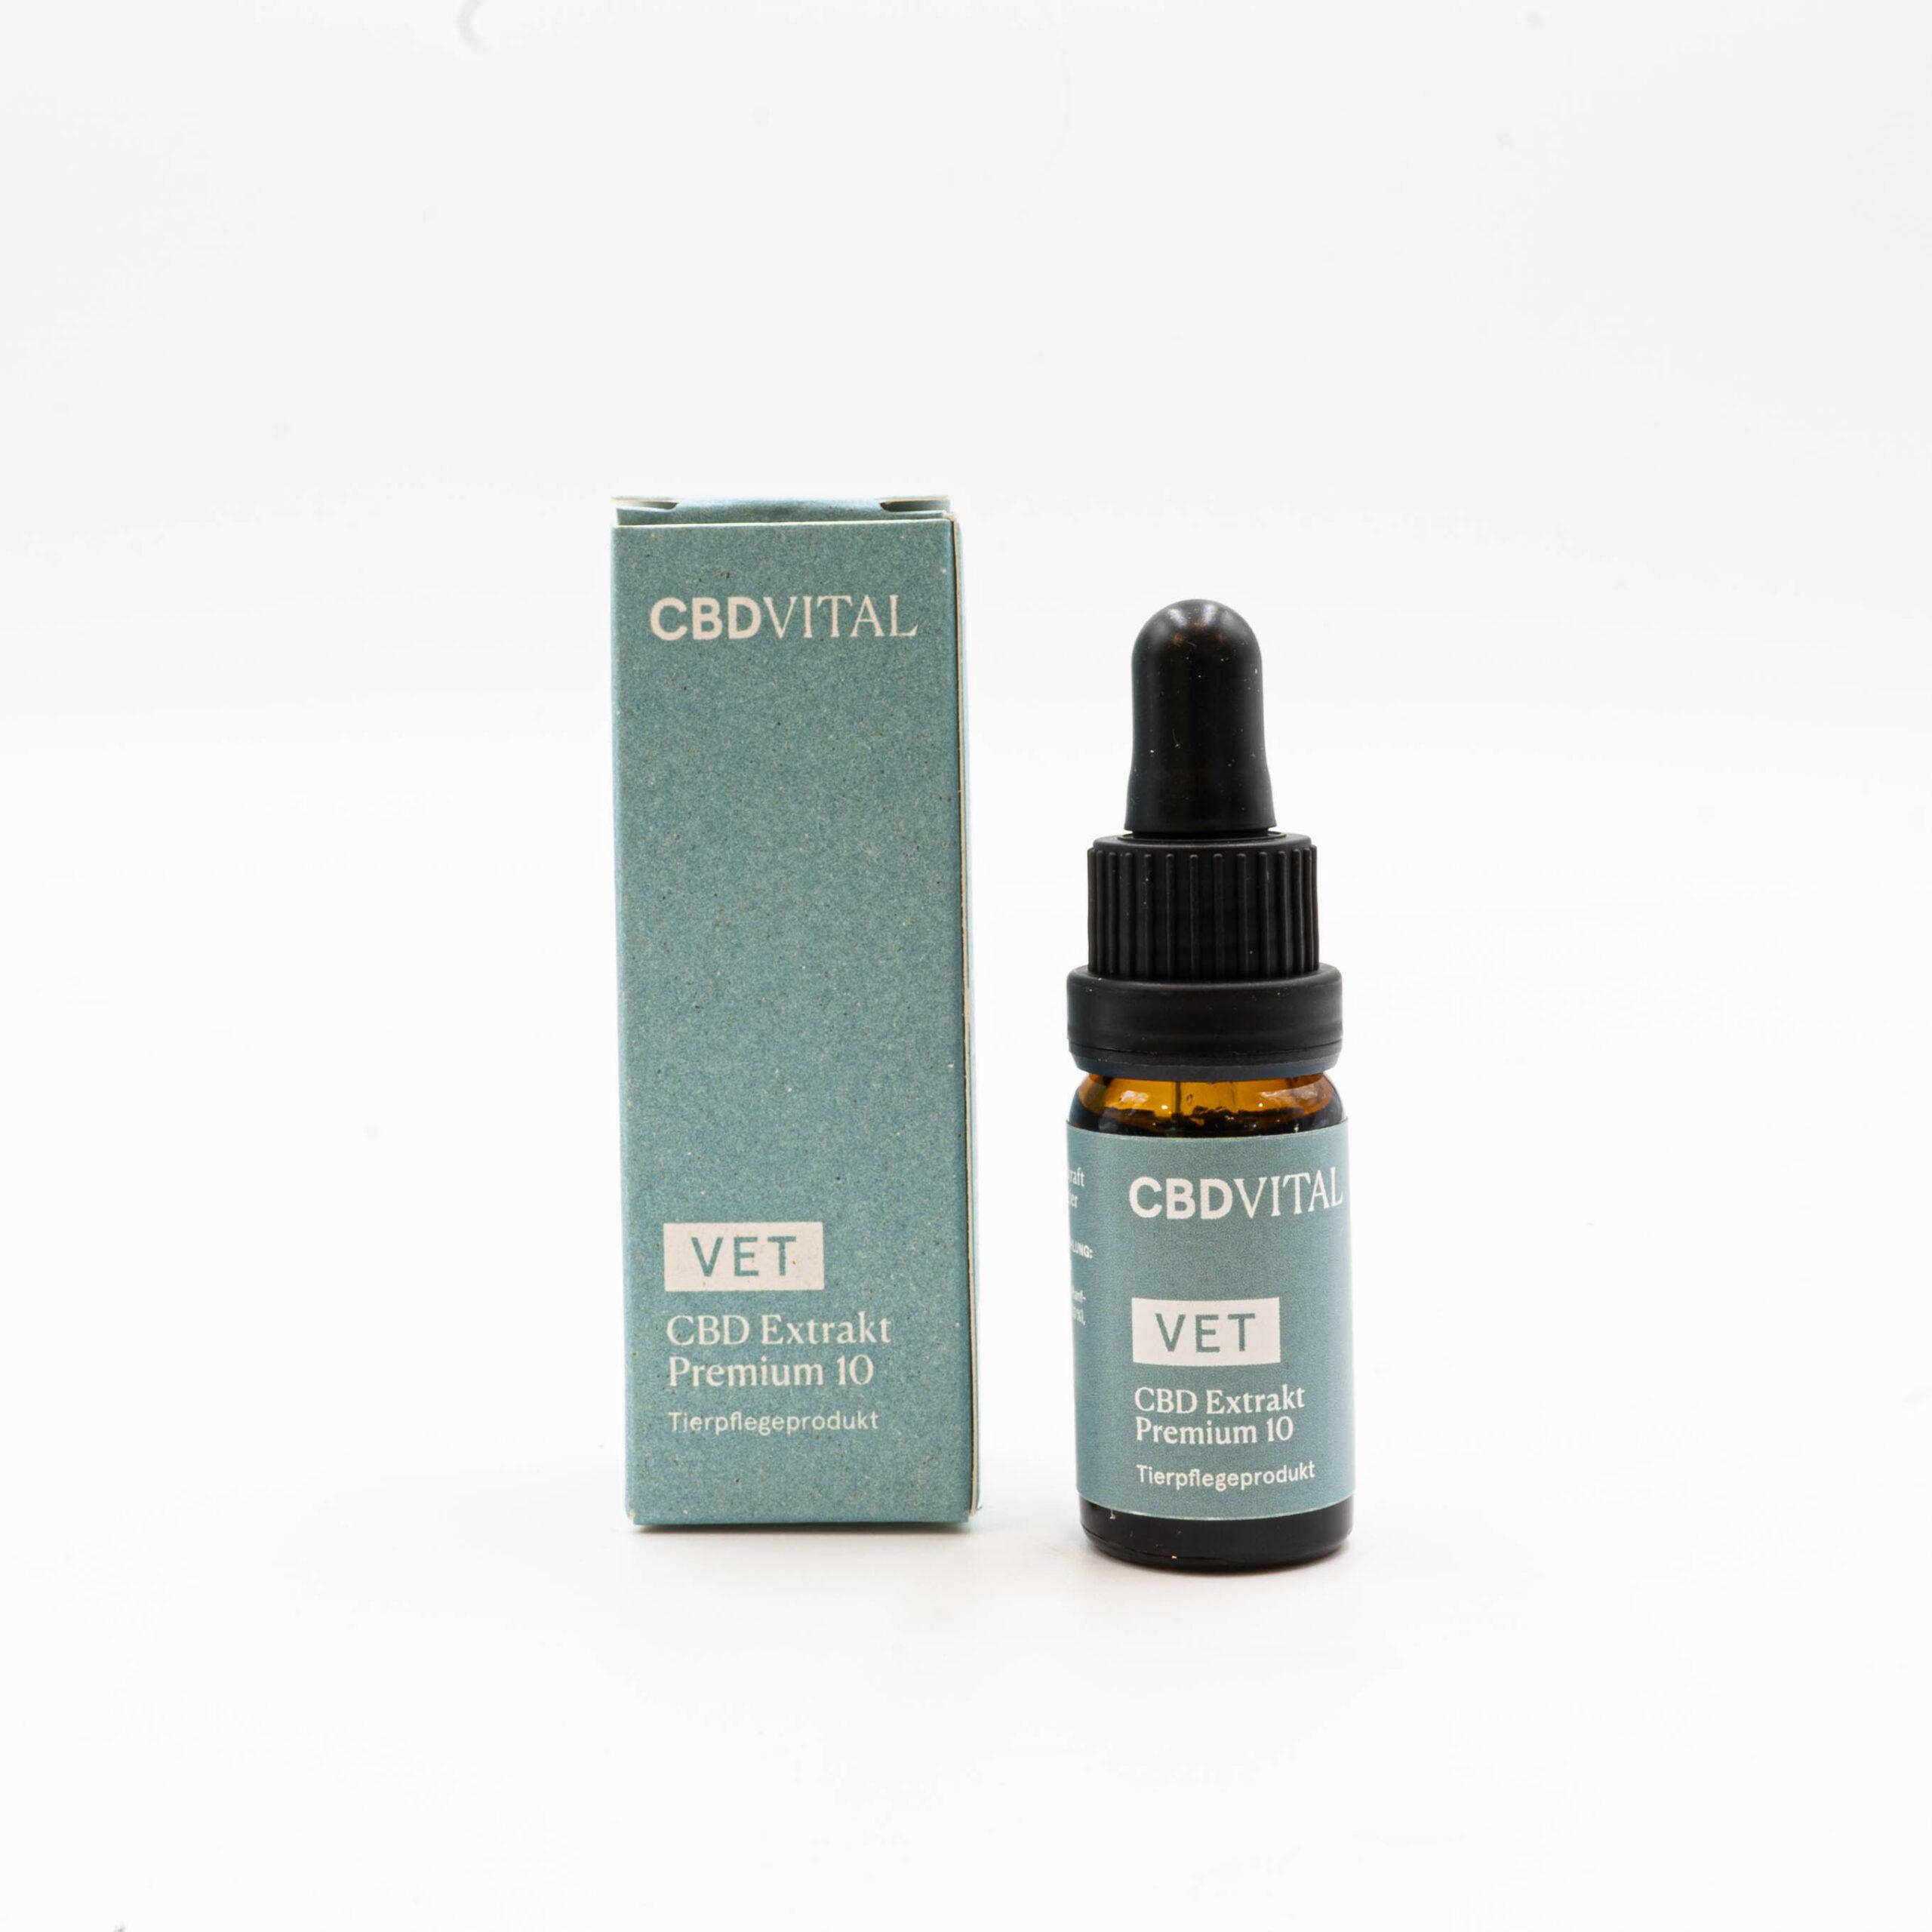 CBD Vital Vet CBD Extrakt Premium 10 % für Tiere ab 20kg - 10ml